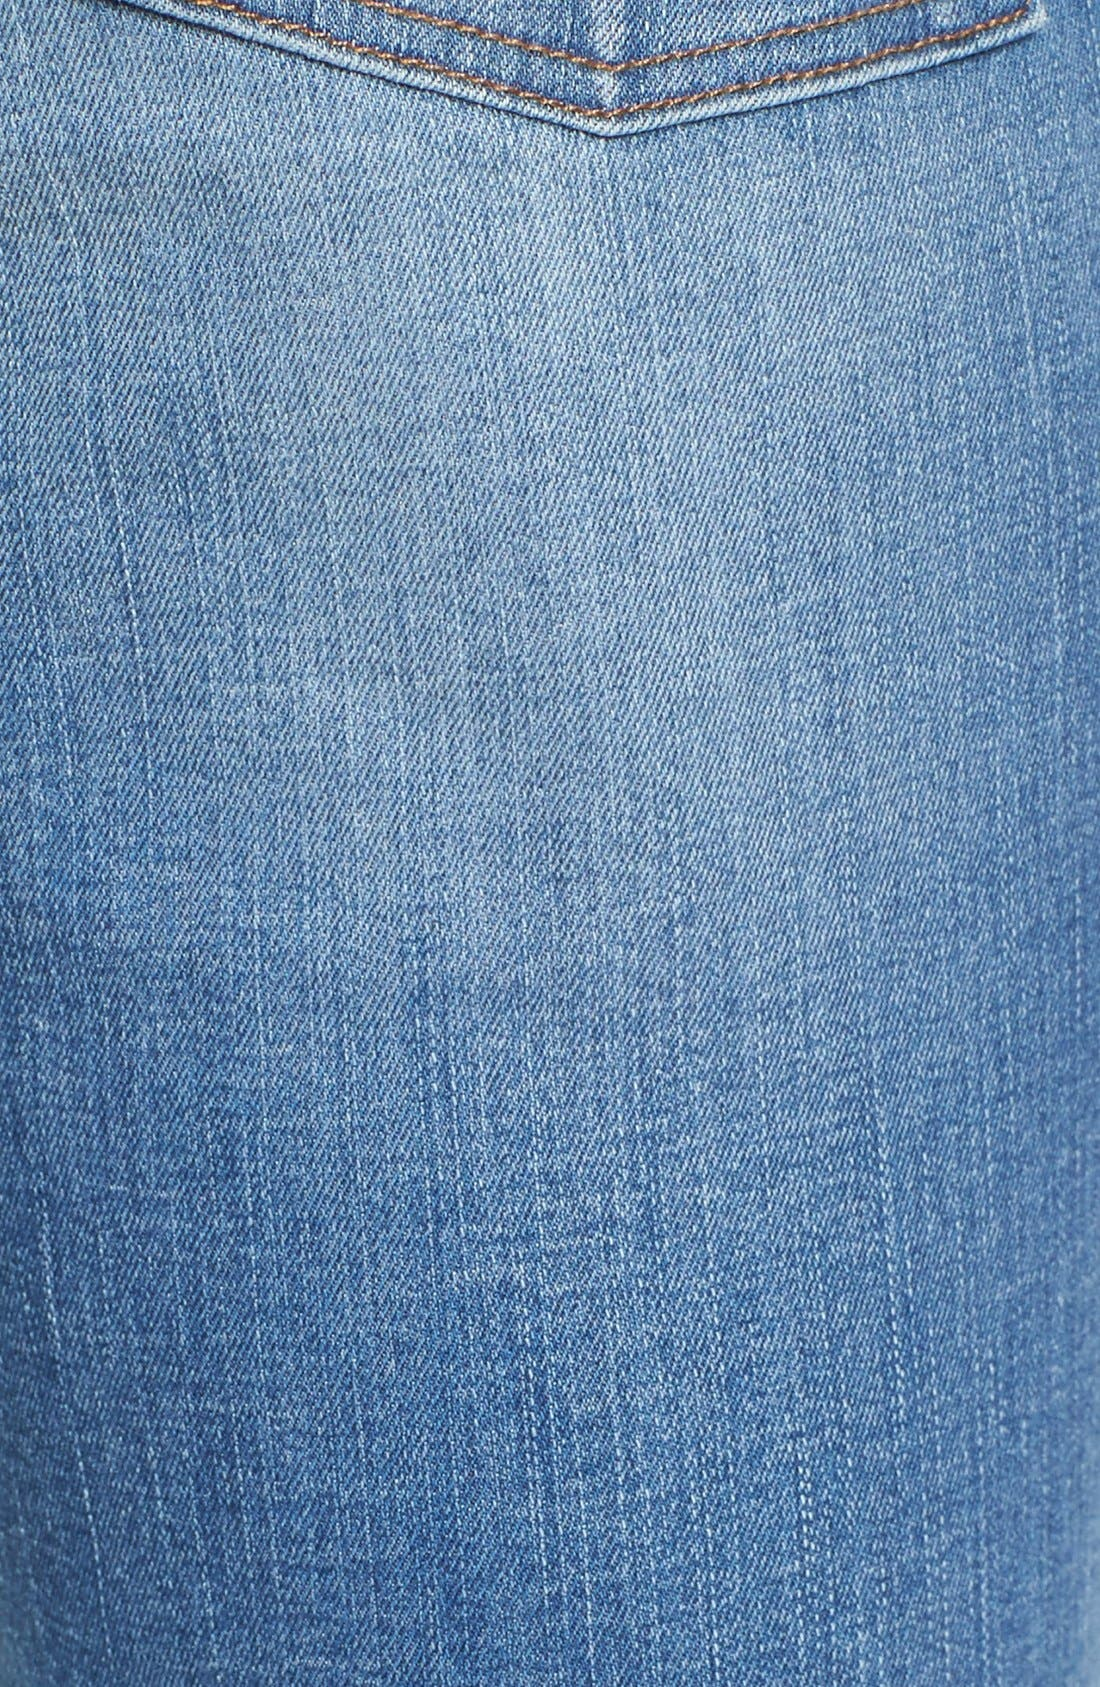 Alternate Image 6  - Madewell 'High Riser - Button Through' Crop Skinny Skinny Jeans (Kearney Wash)